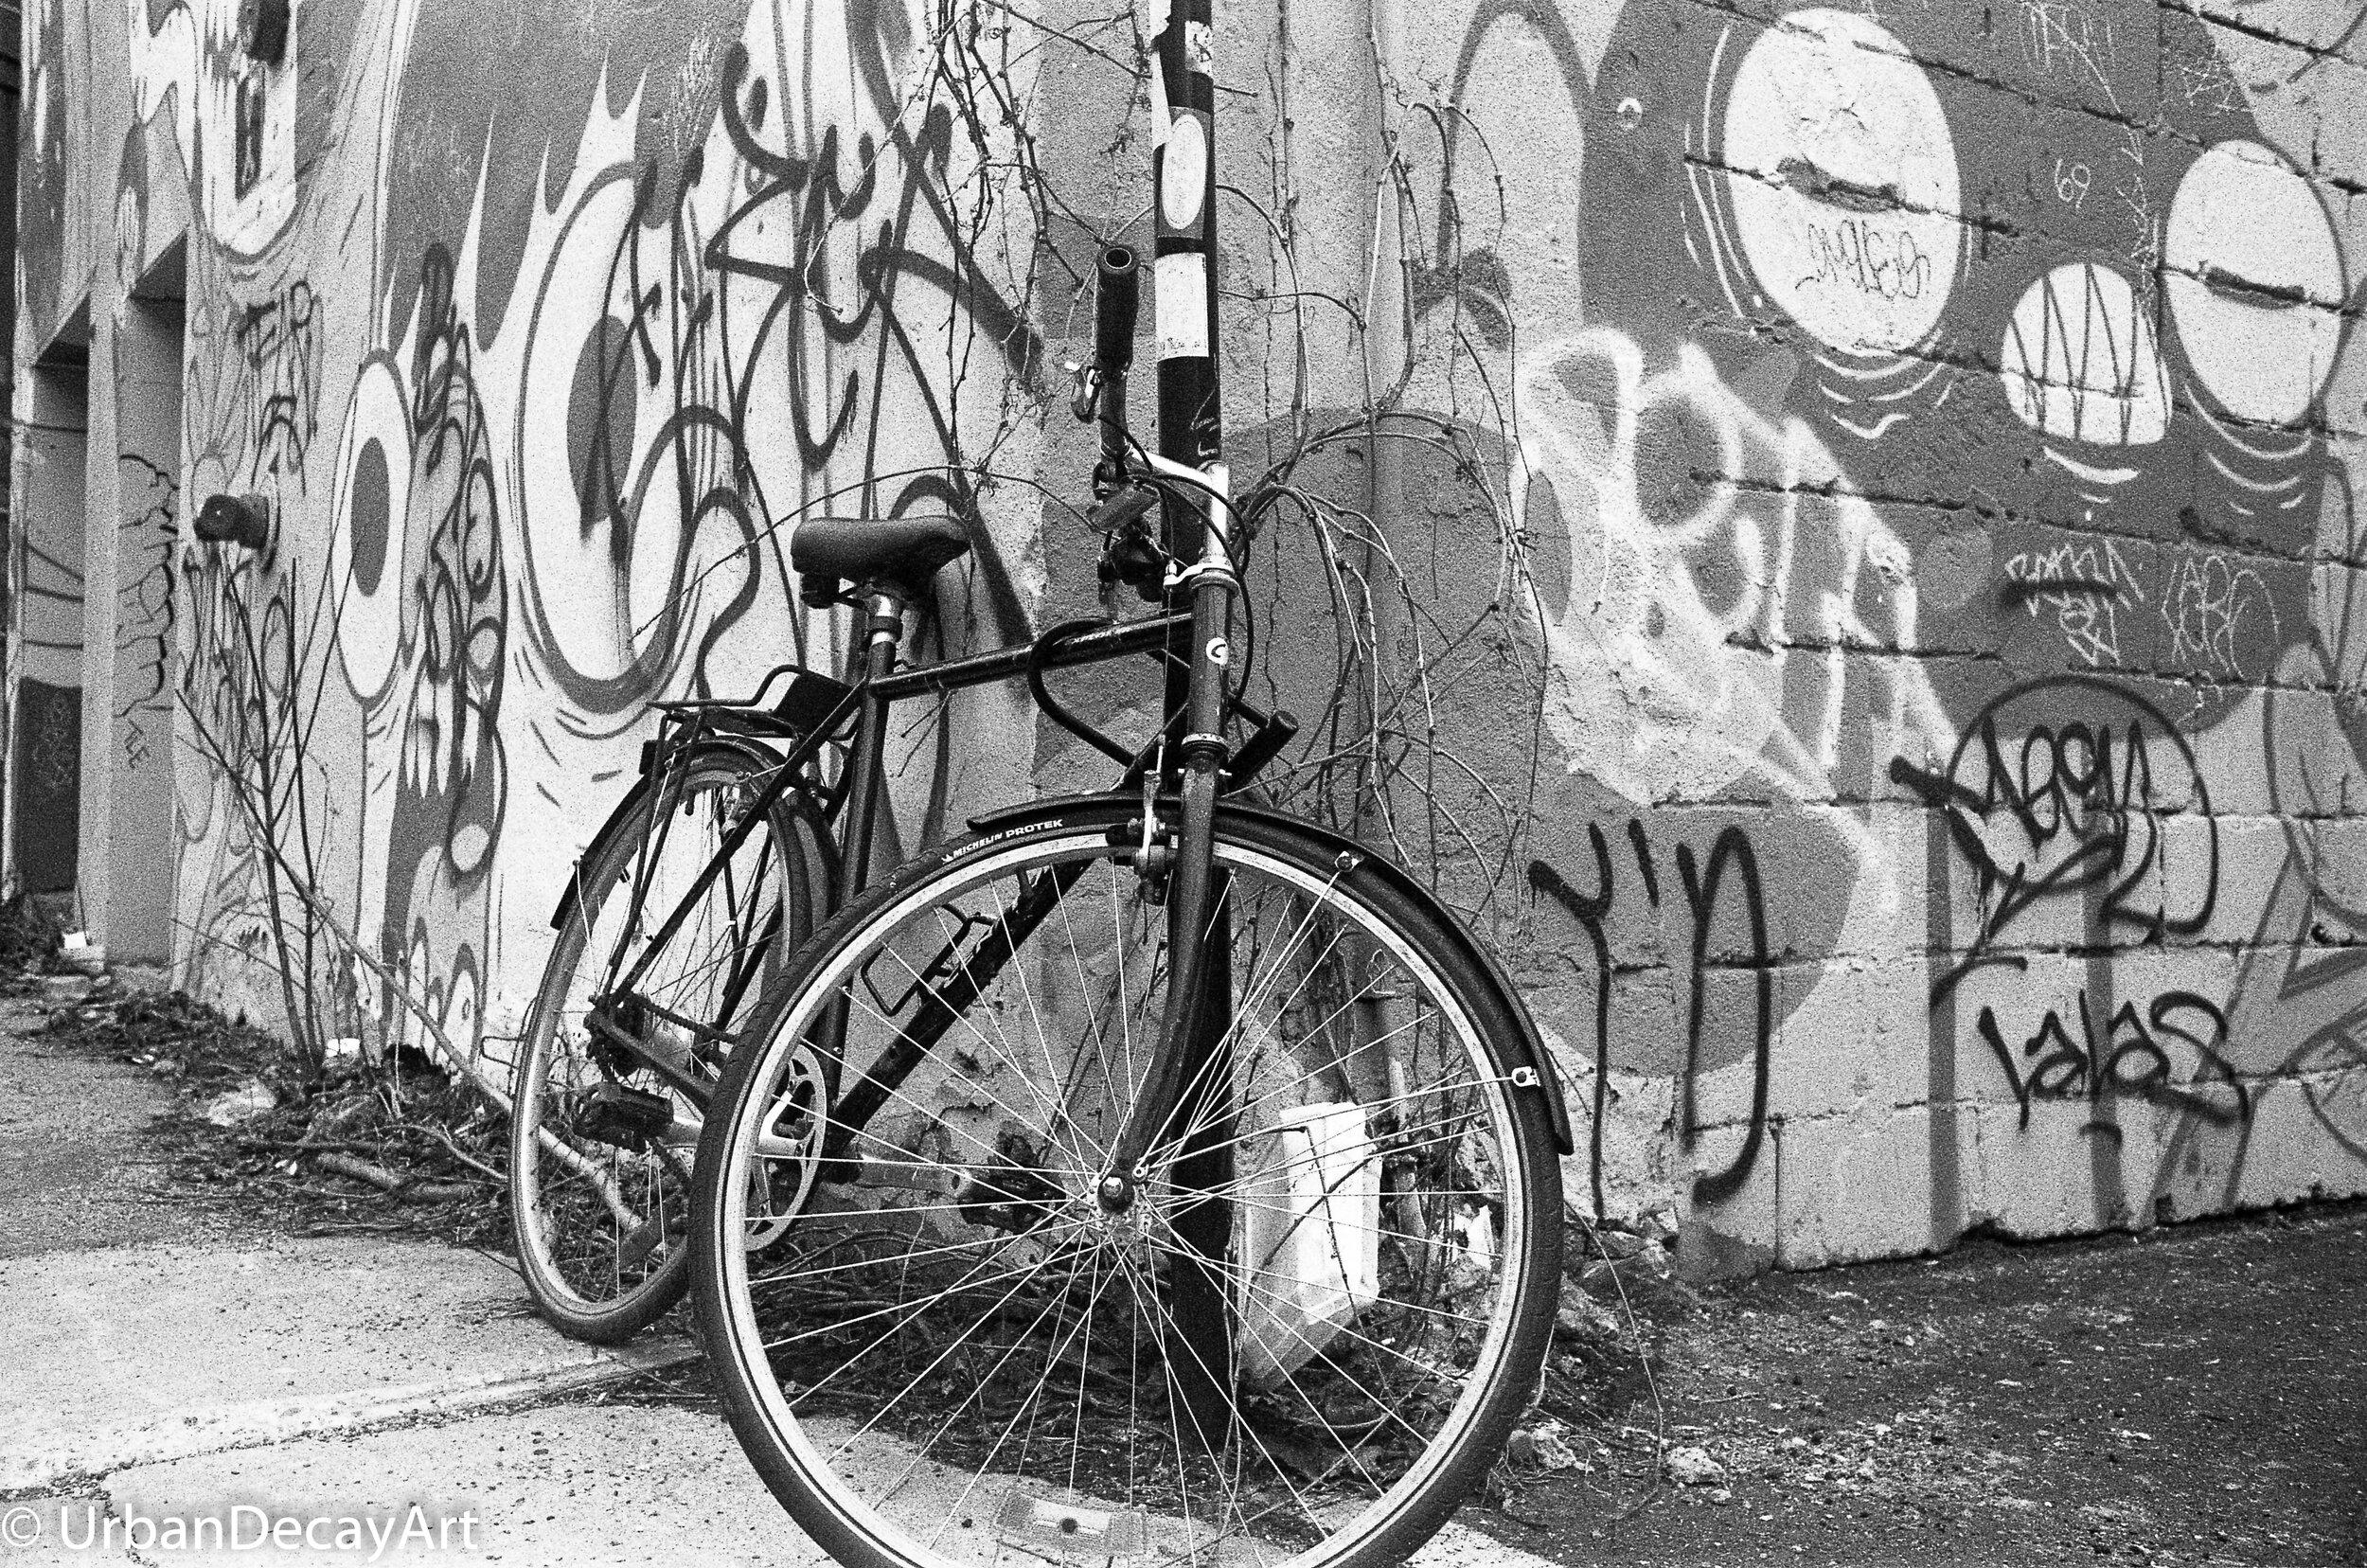 GraffitiBike-100540.jpg